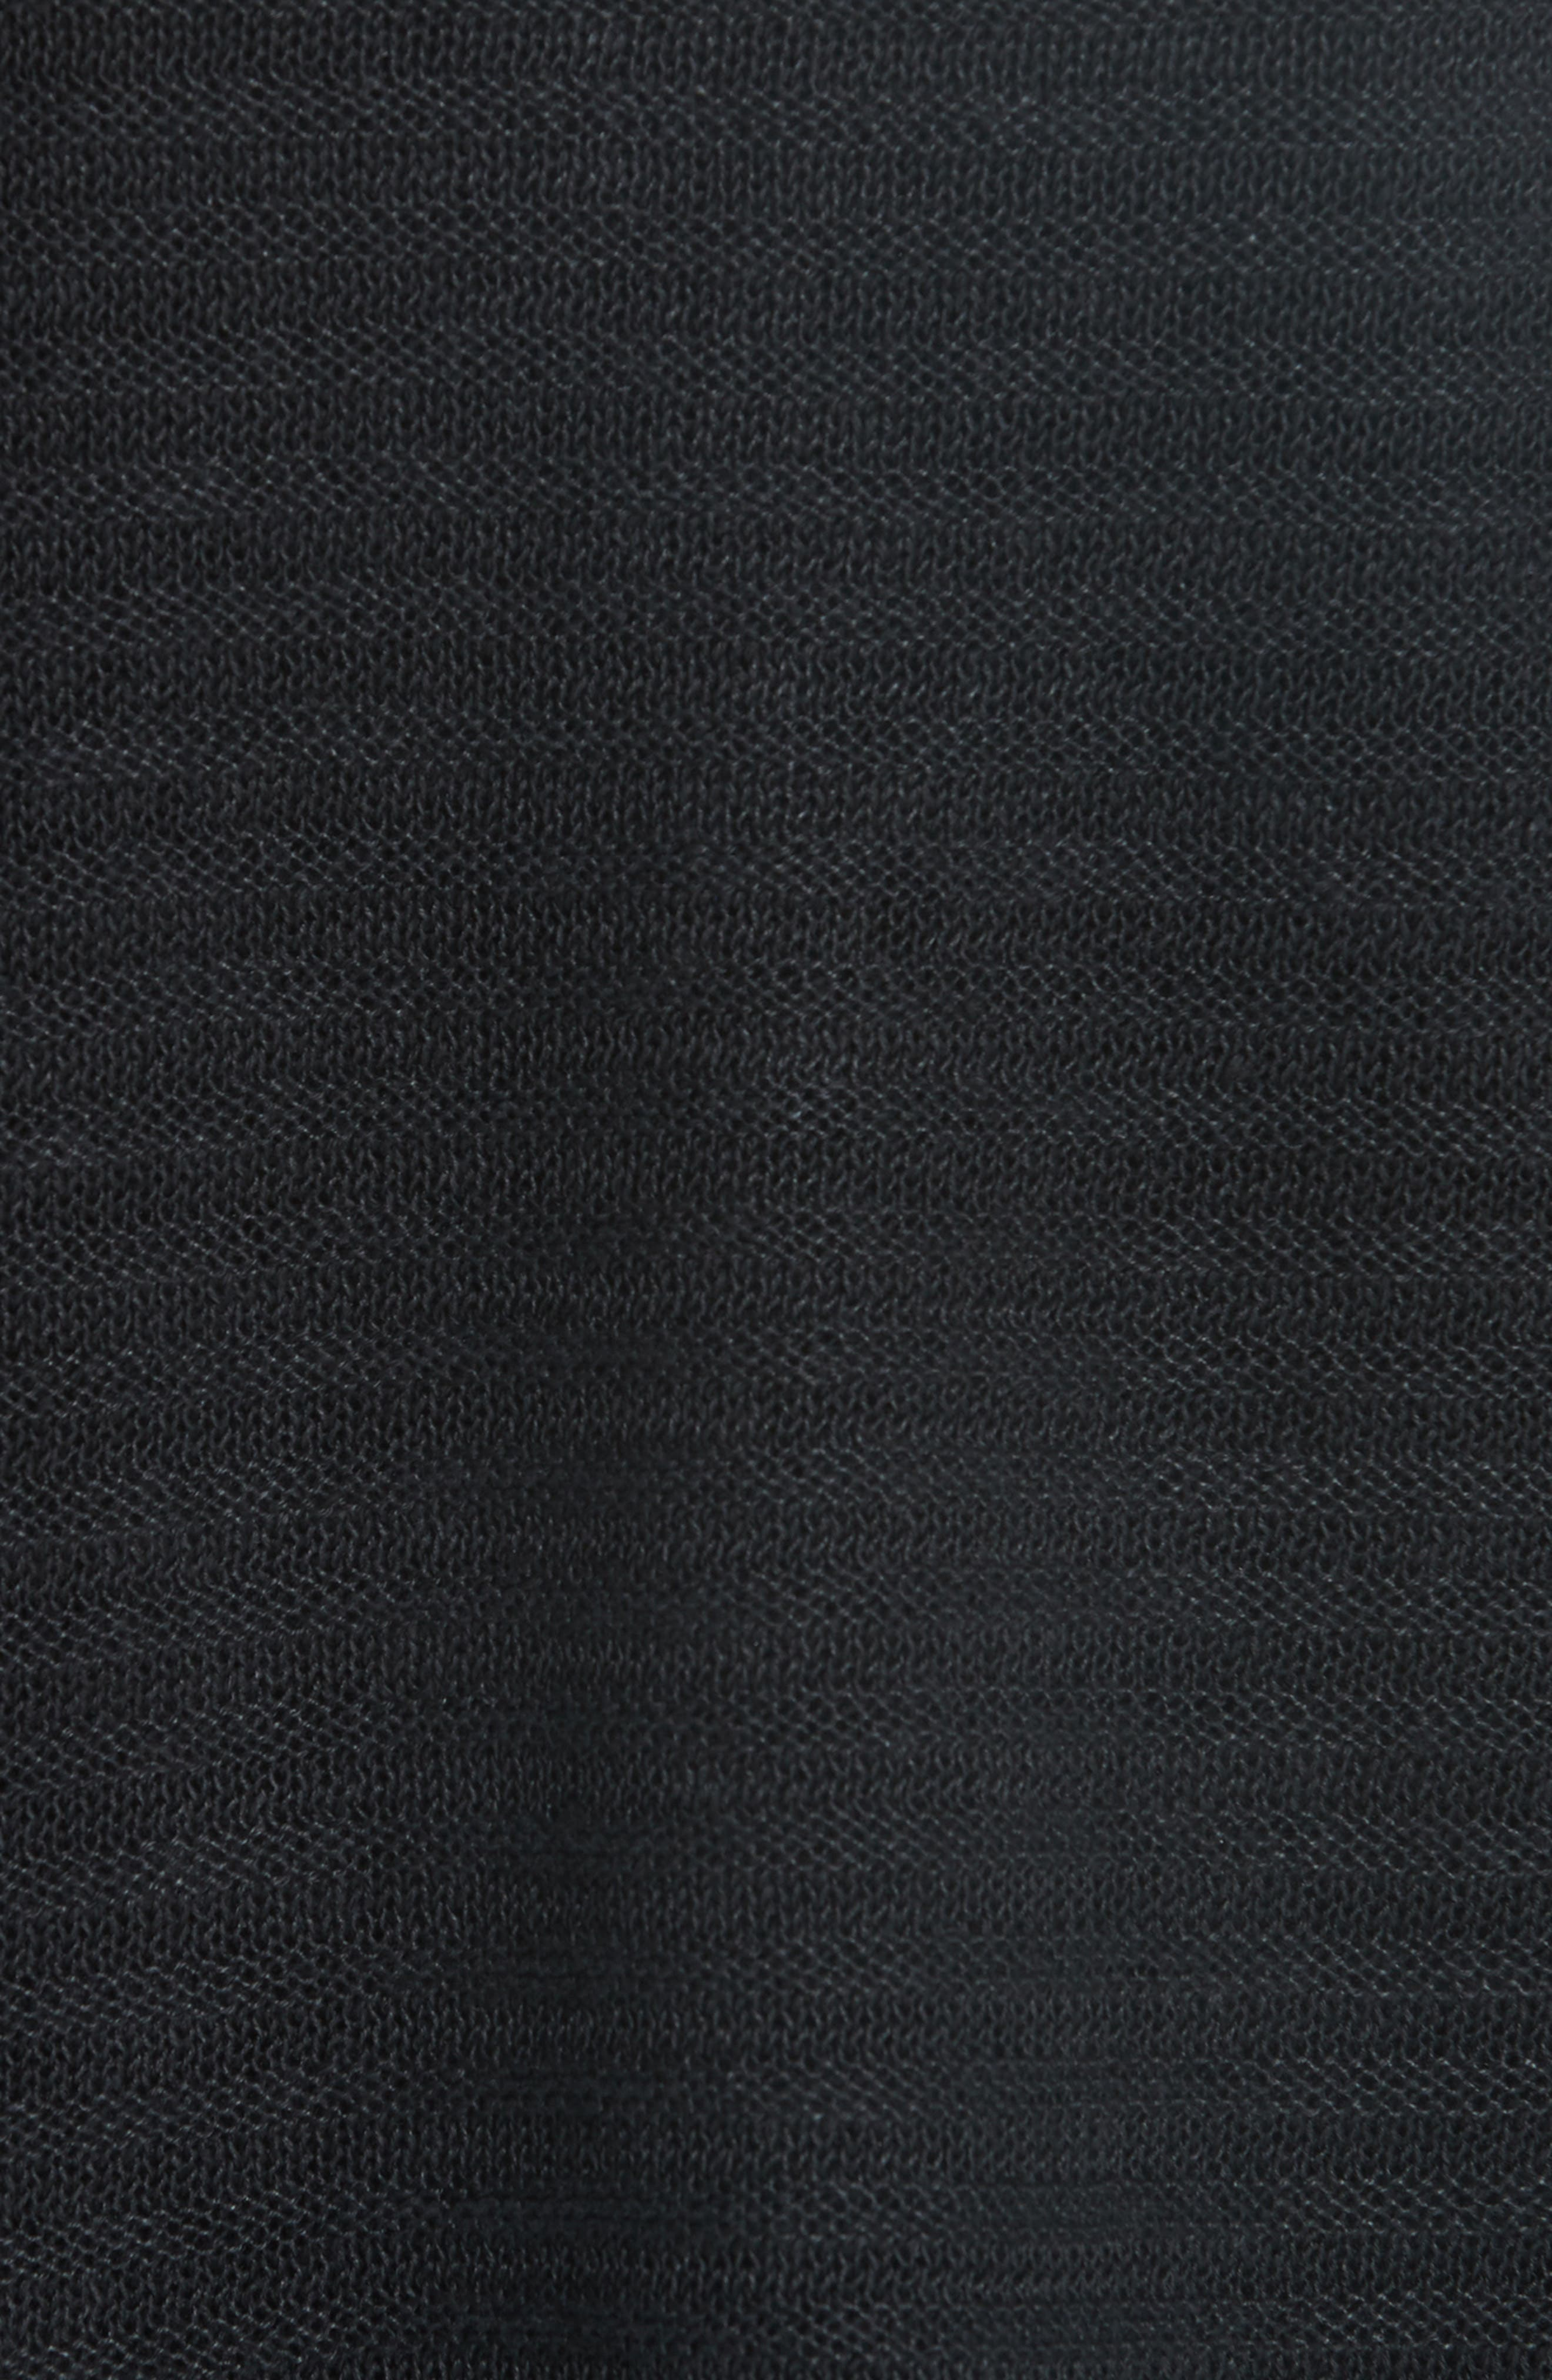 Slit Sleeve Organic Linen Sweater,                             Alternate thumbnail 5, color,                             001